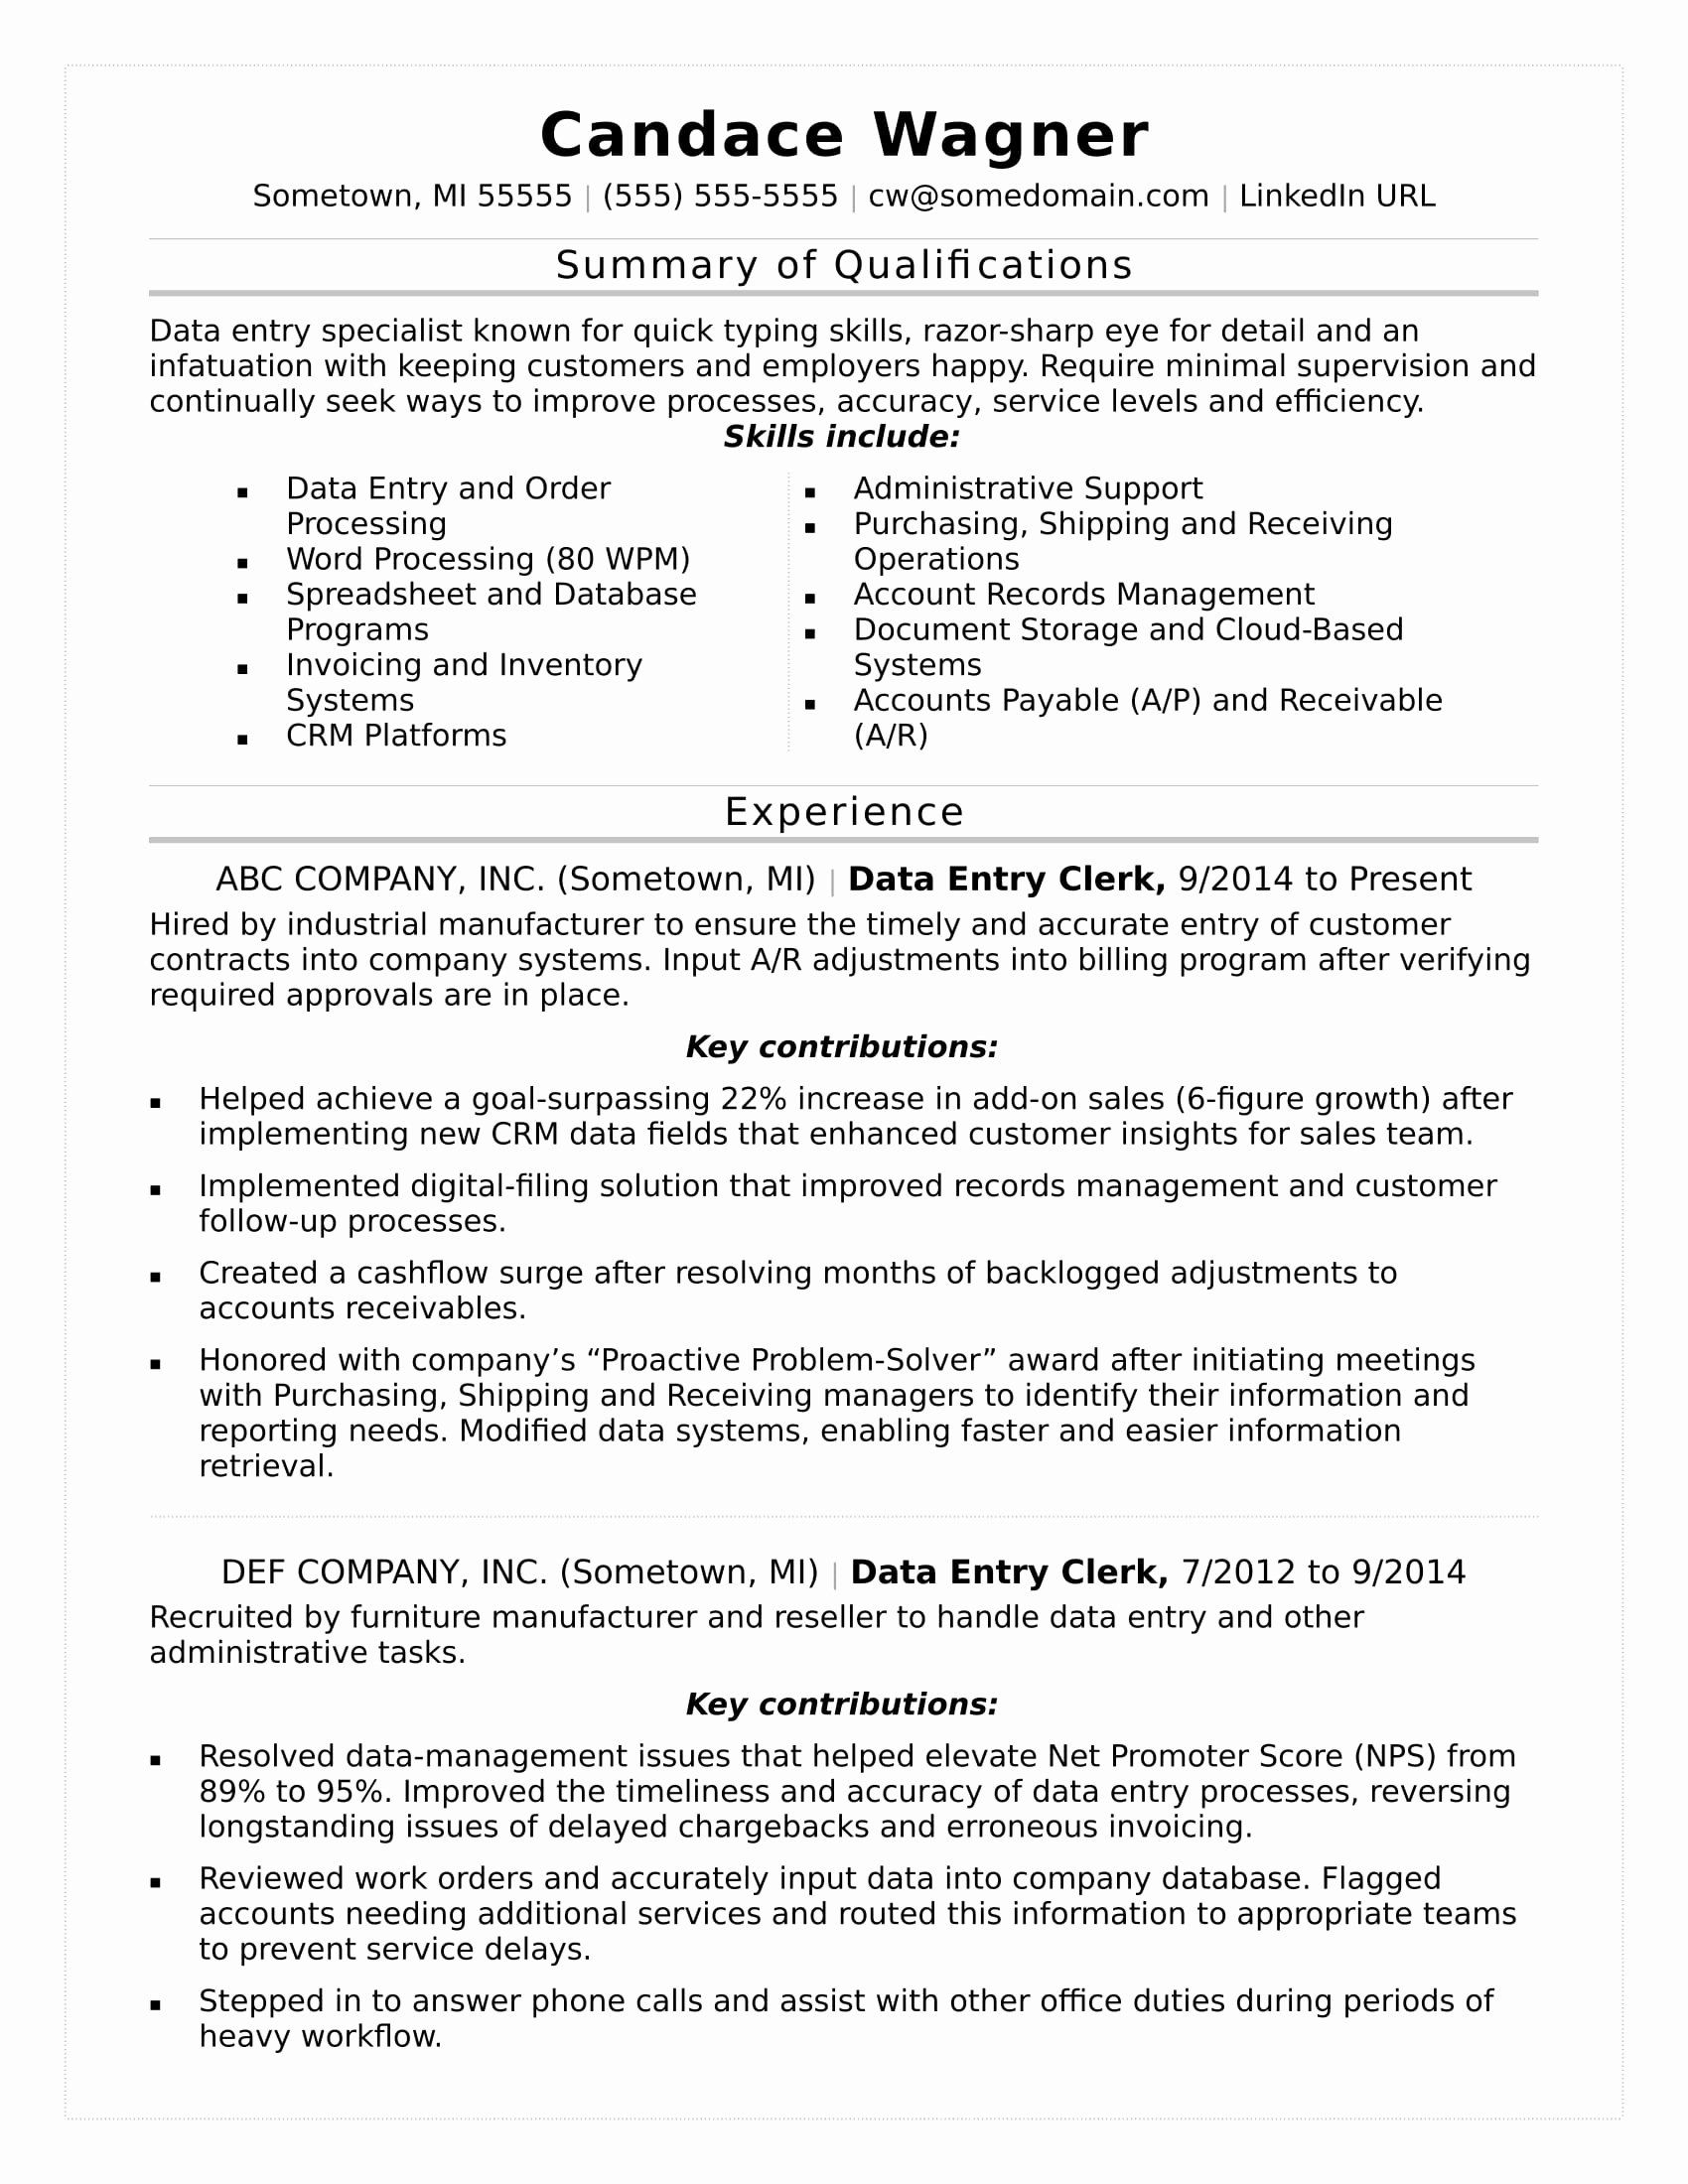 Data Center Technician Resume Beautiful Data Entry Resume Sample Basic Resume Resume Template Word Resume Template